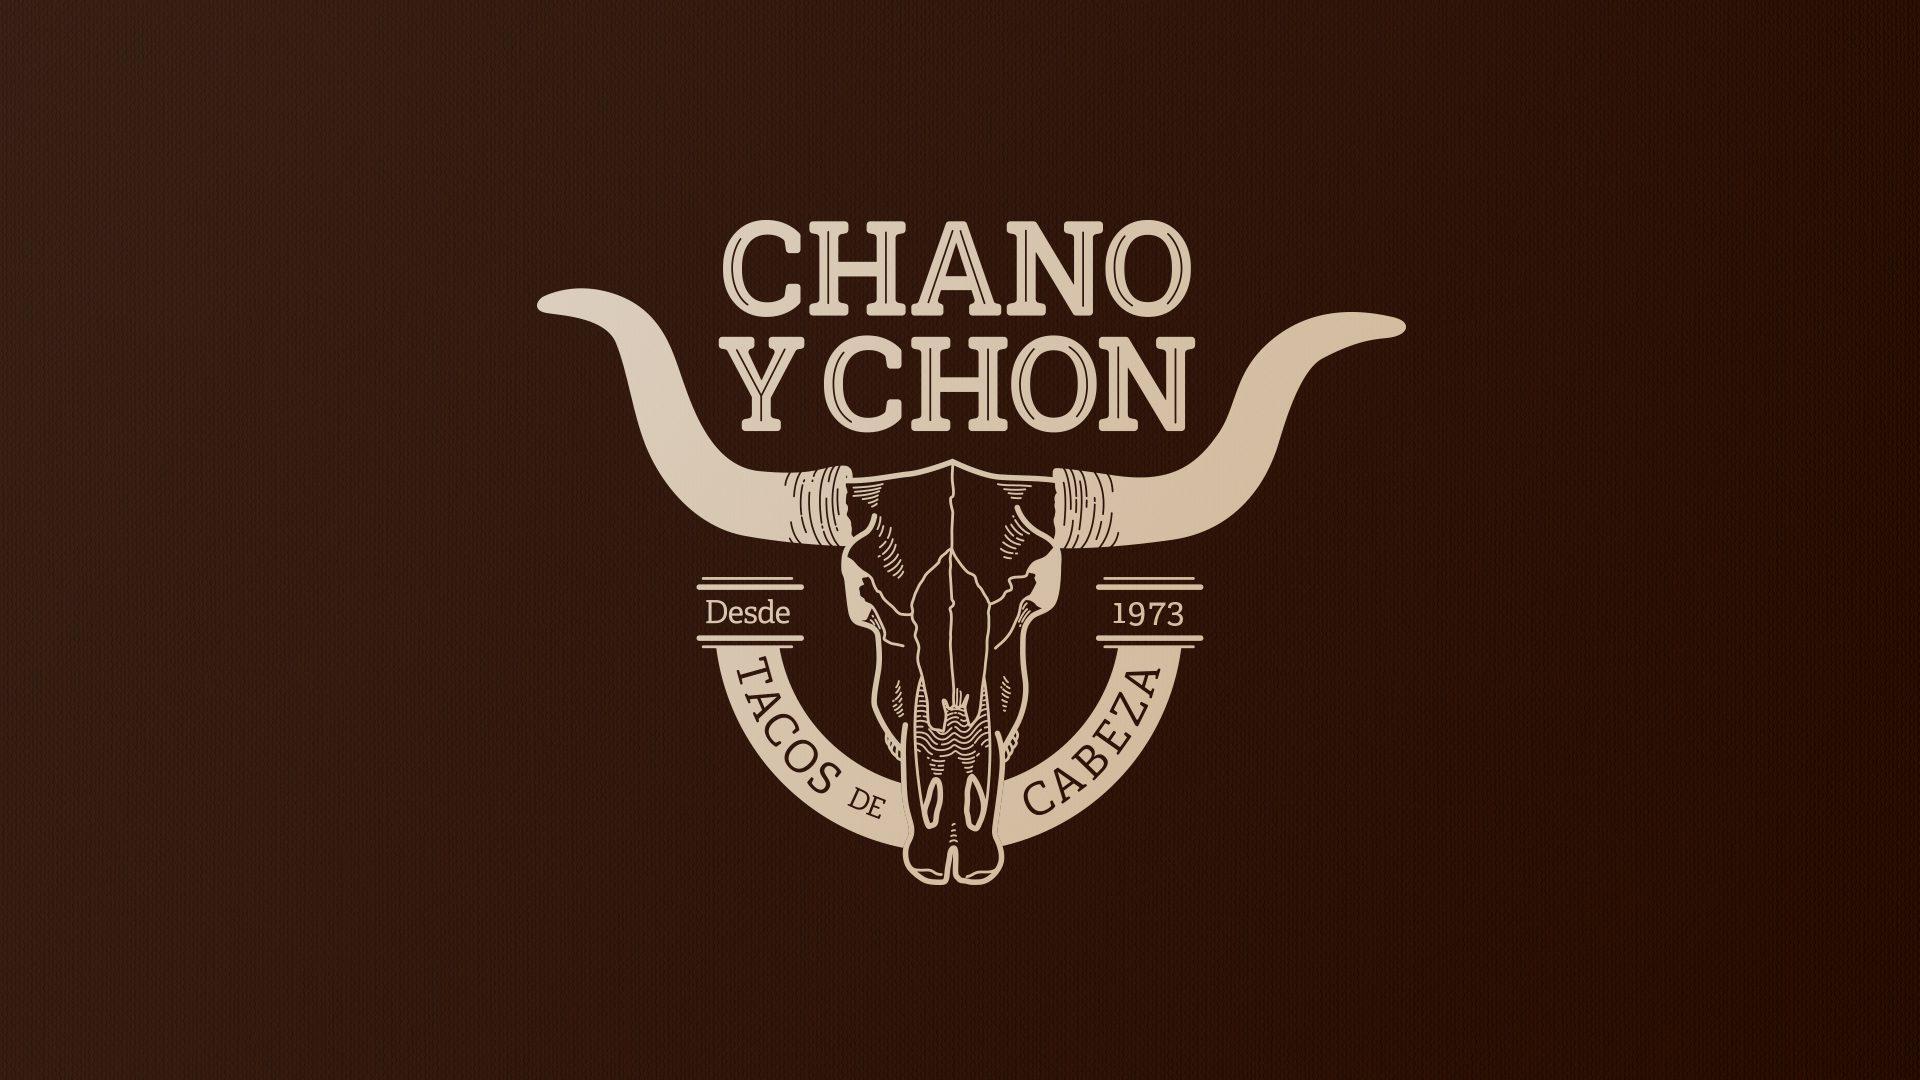 Chano y Chon